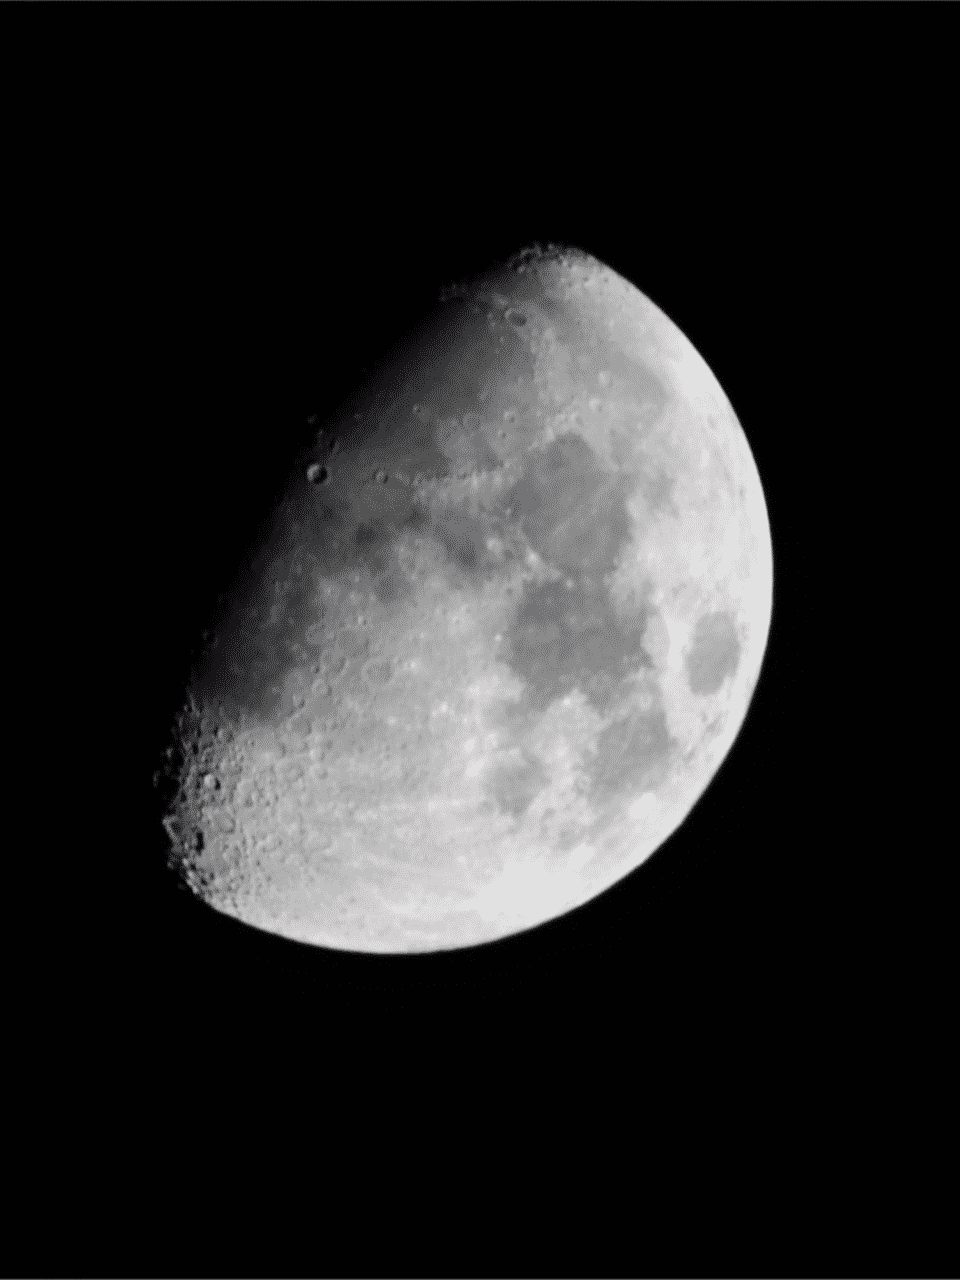 http://zachh.lt/wp-content/uploads/2019/09/menulis-moon-960x1280.png